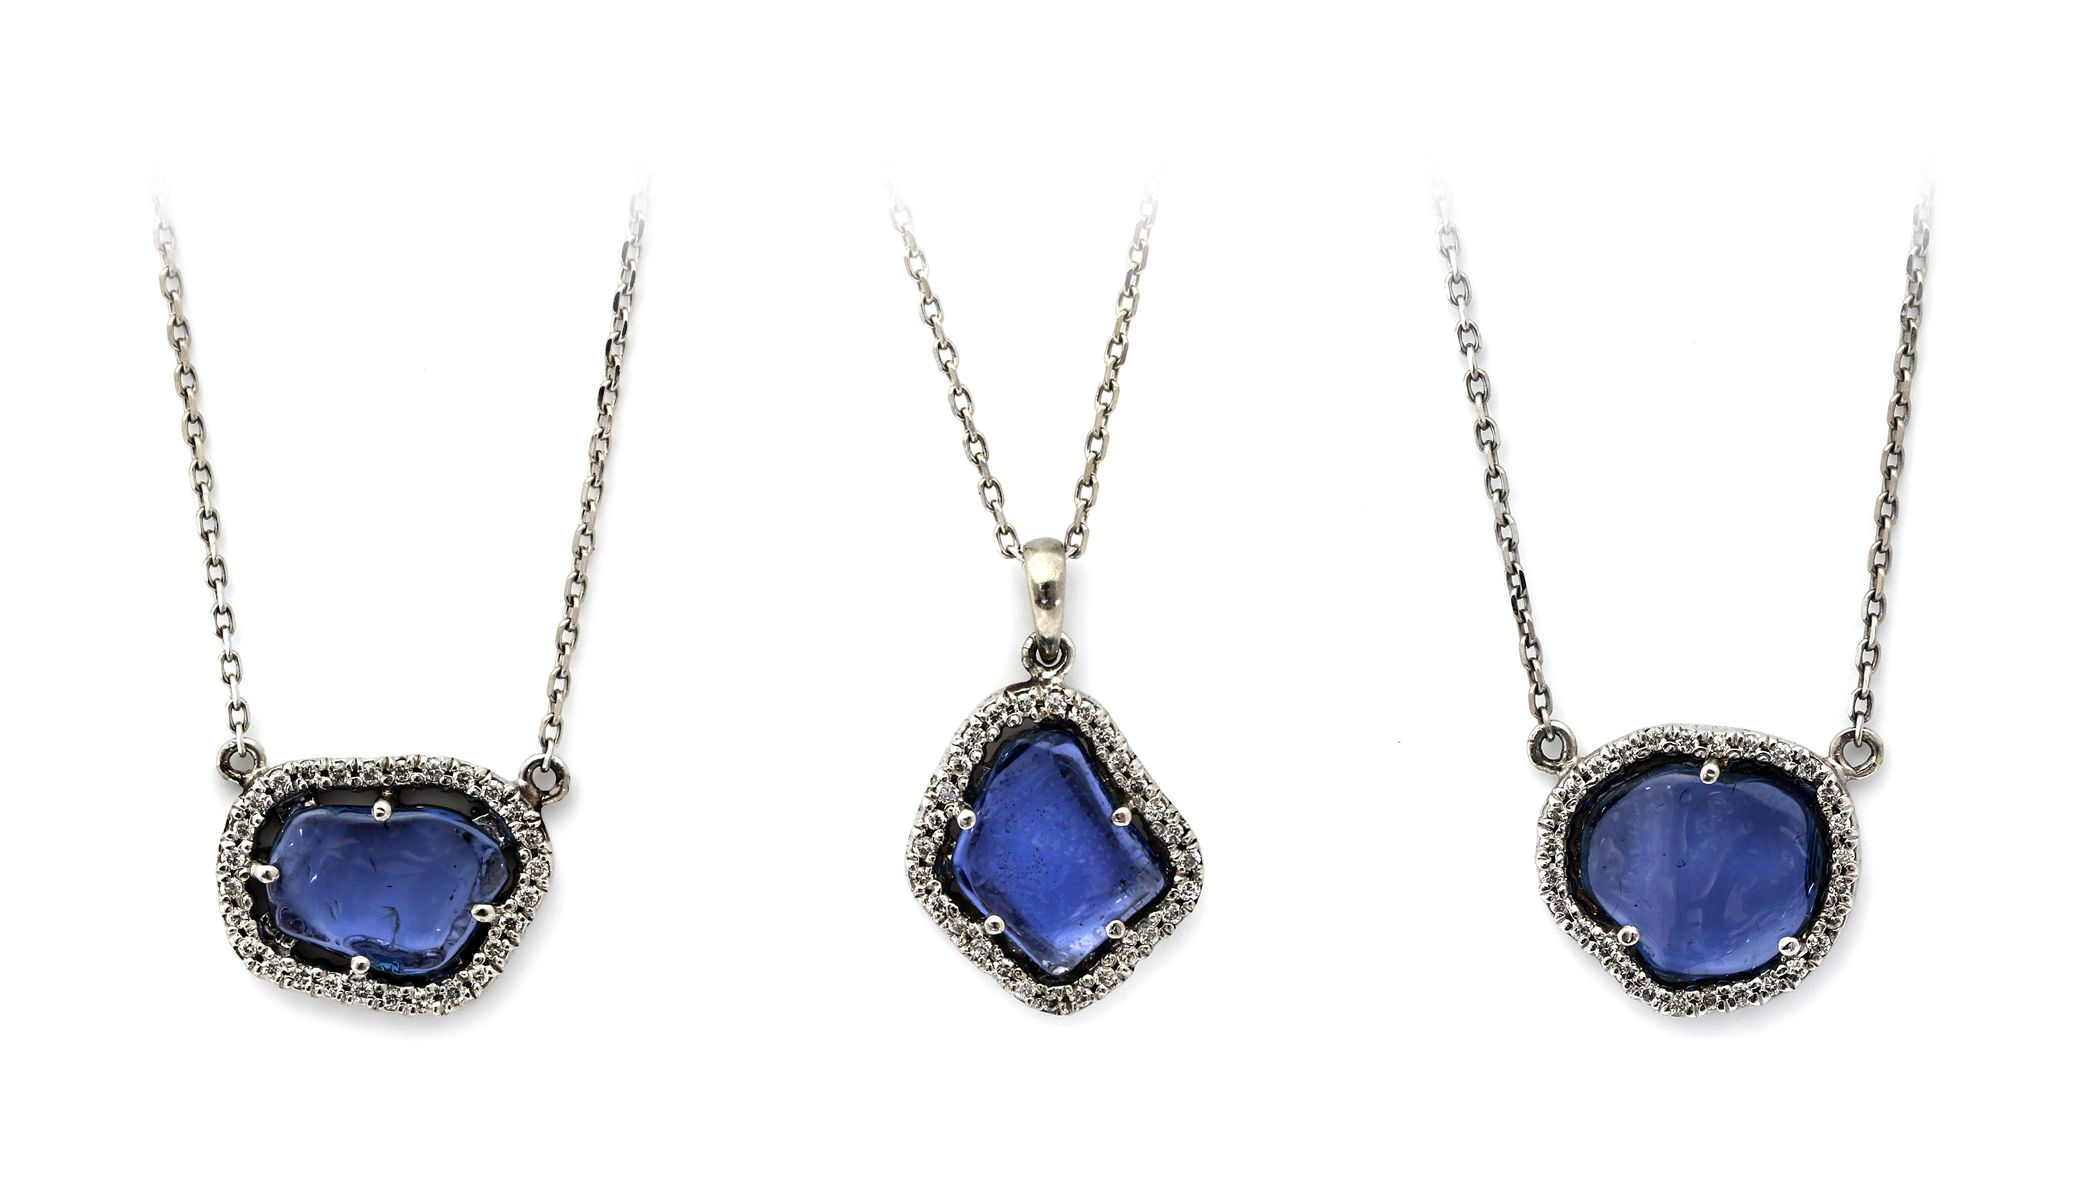 Polished Rough Yogo Sapphire Pendants | Sapphire pendant ...Unpolished Sapphire Necklace